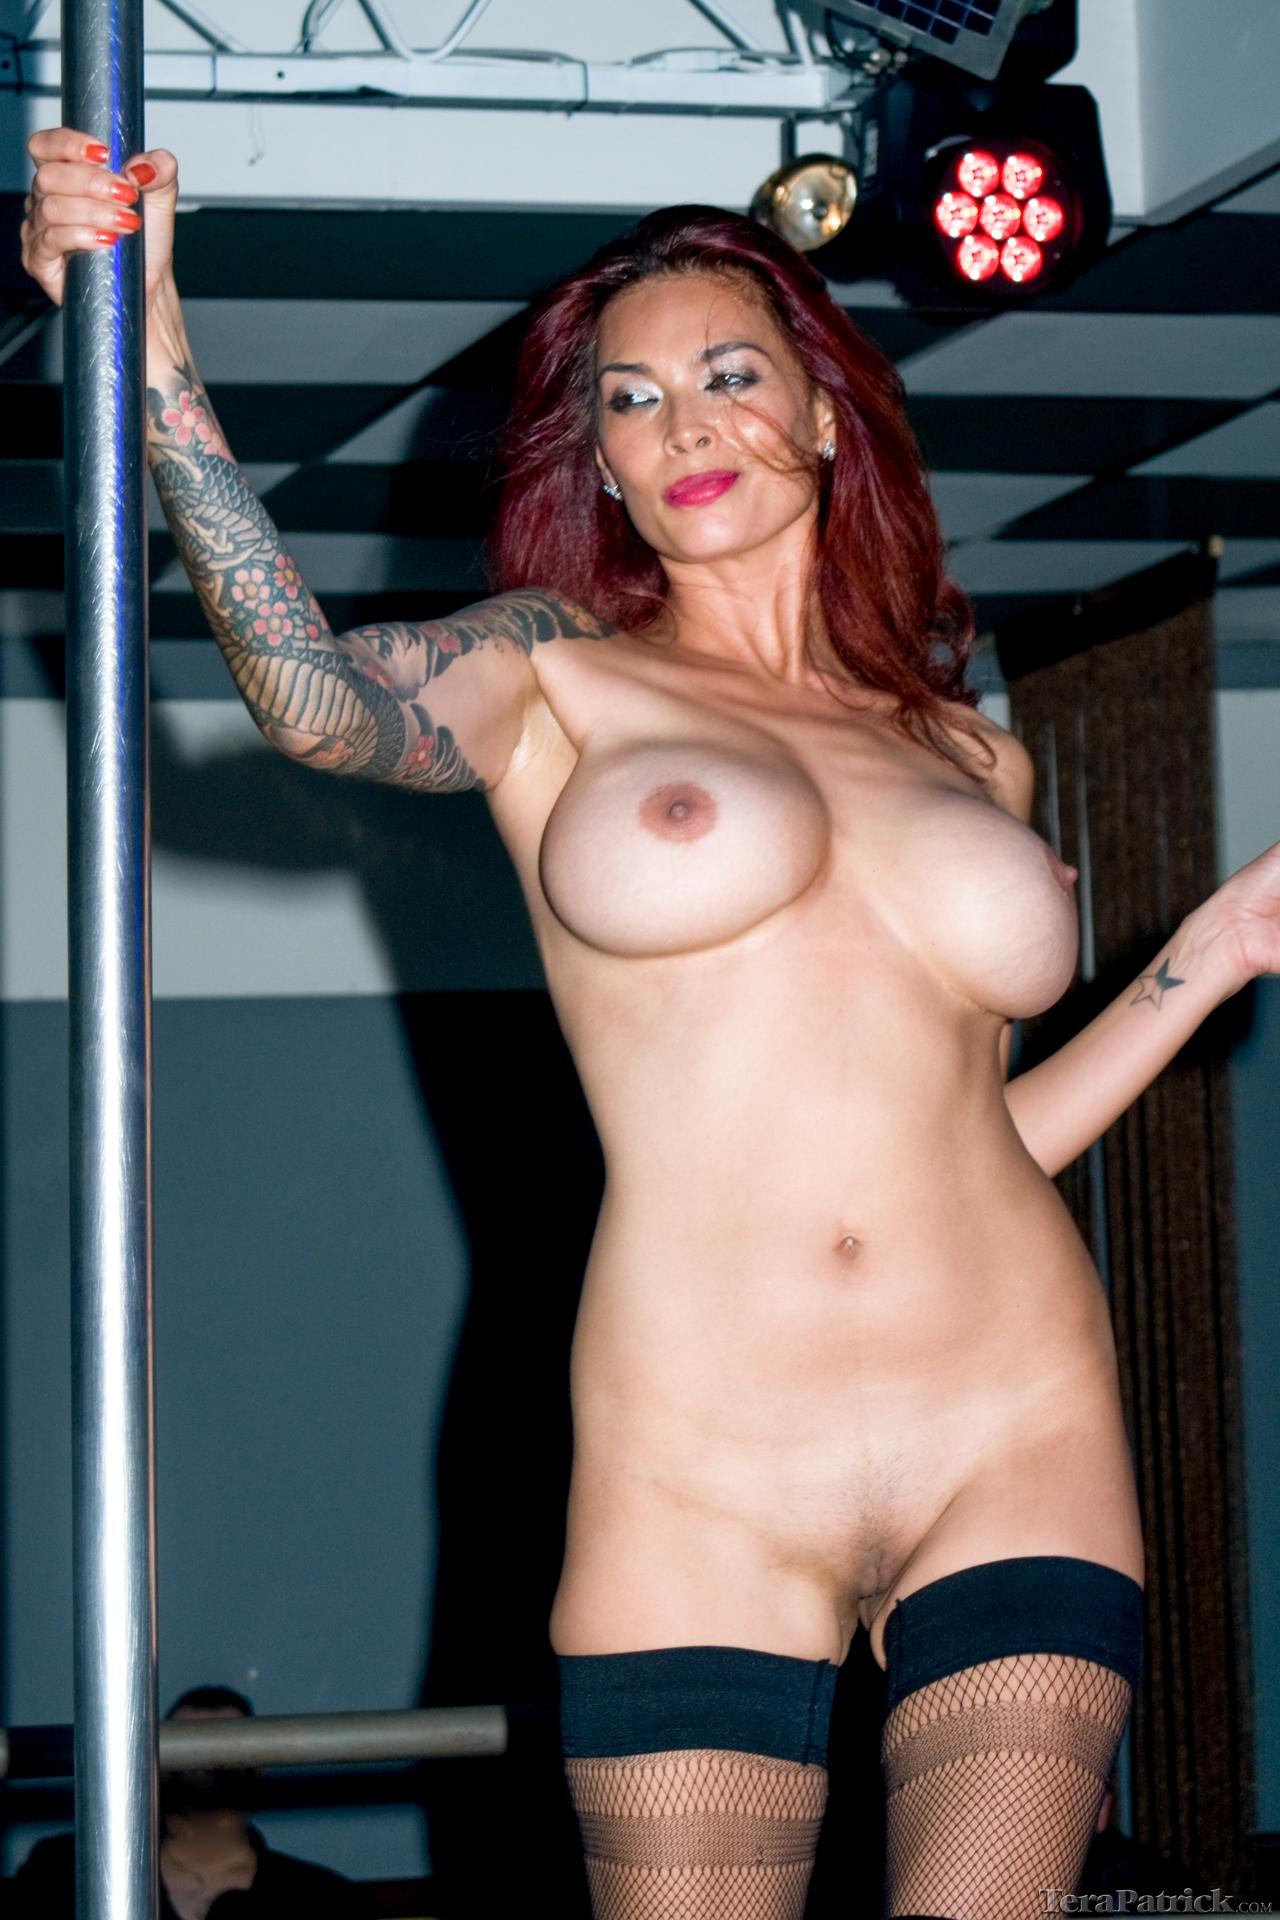 jump rope girl nude gif